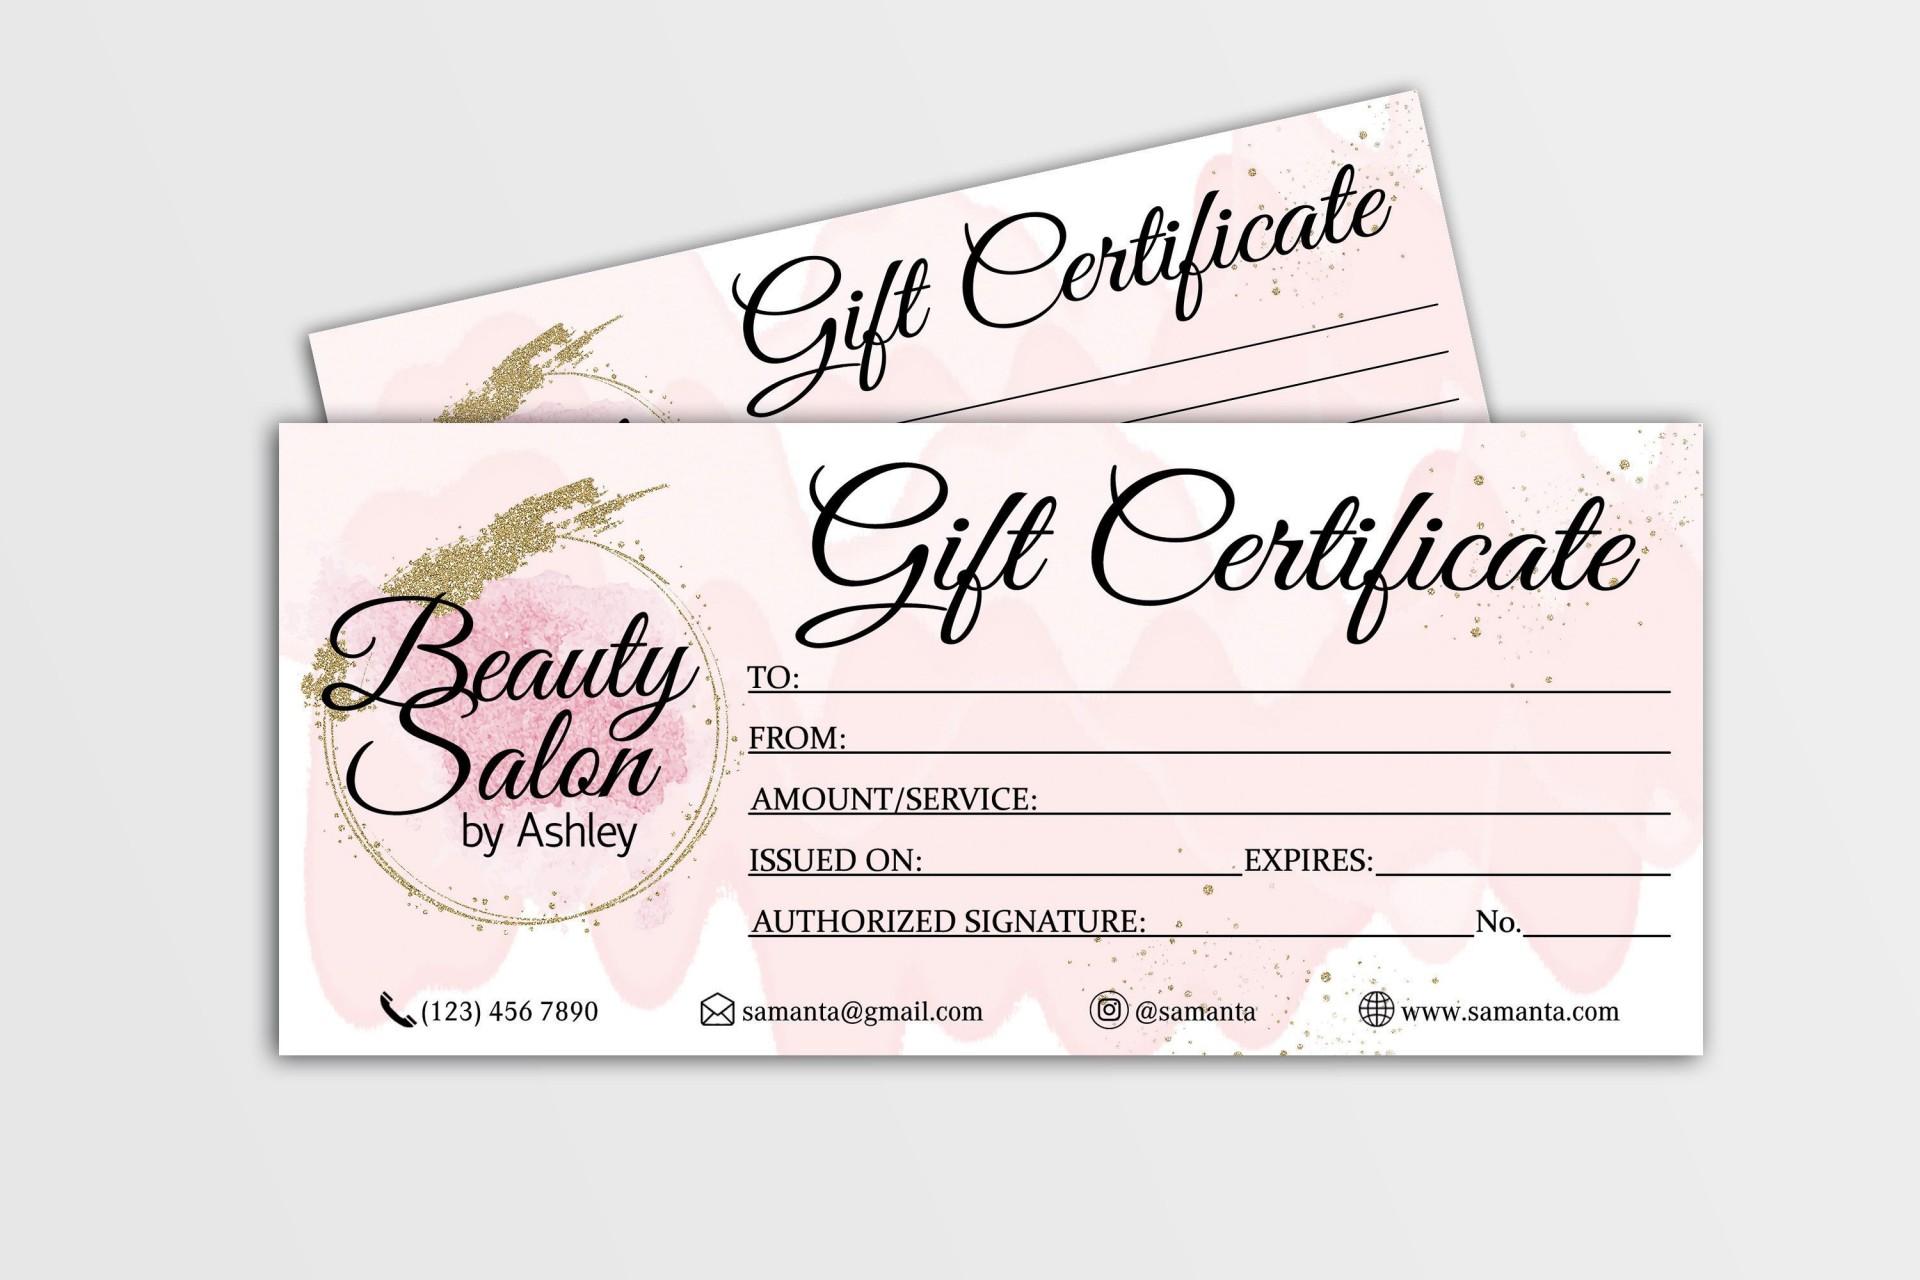 004 Fascinating Salon Gift Certificate Template Design  Templates1920